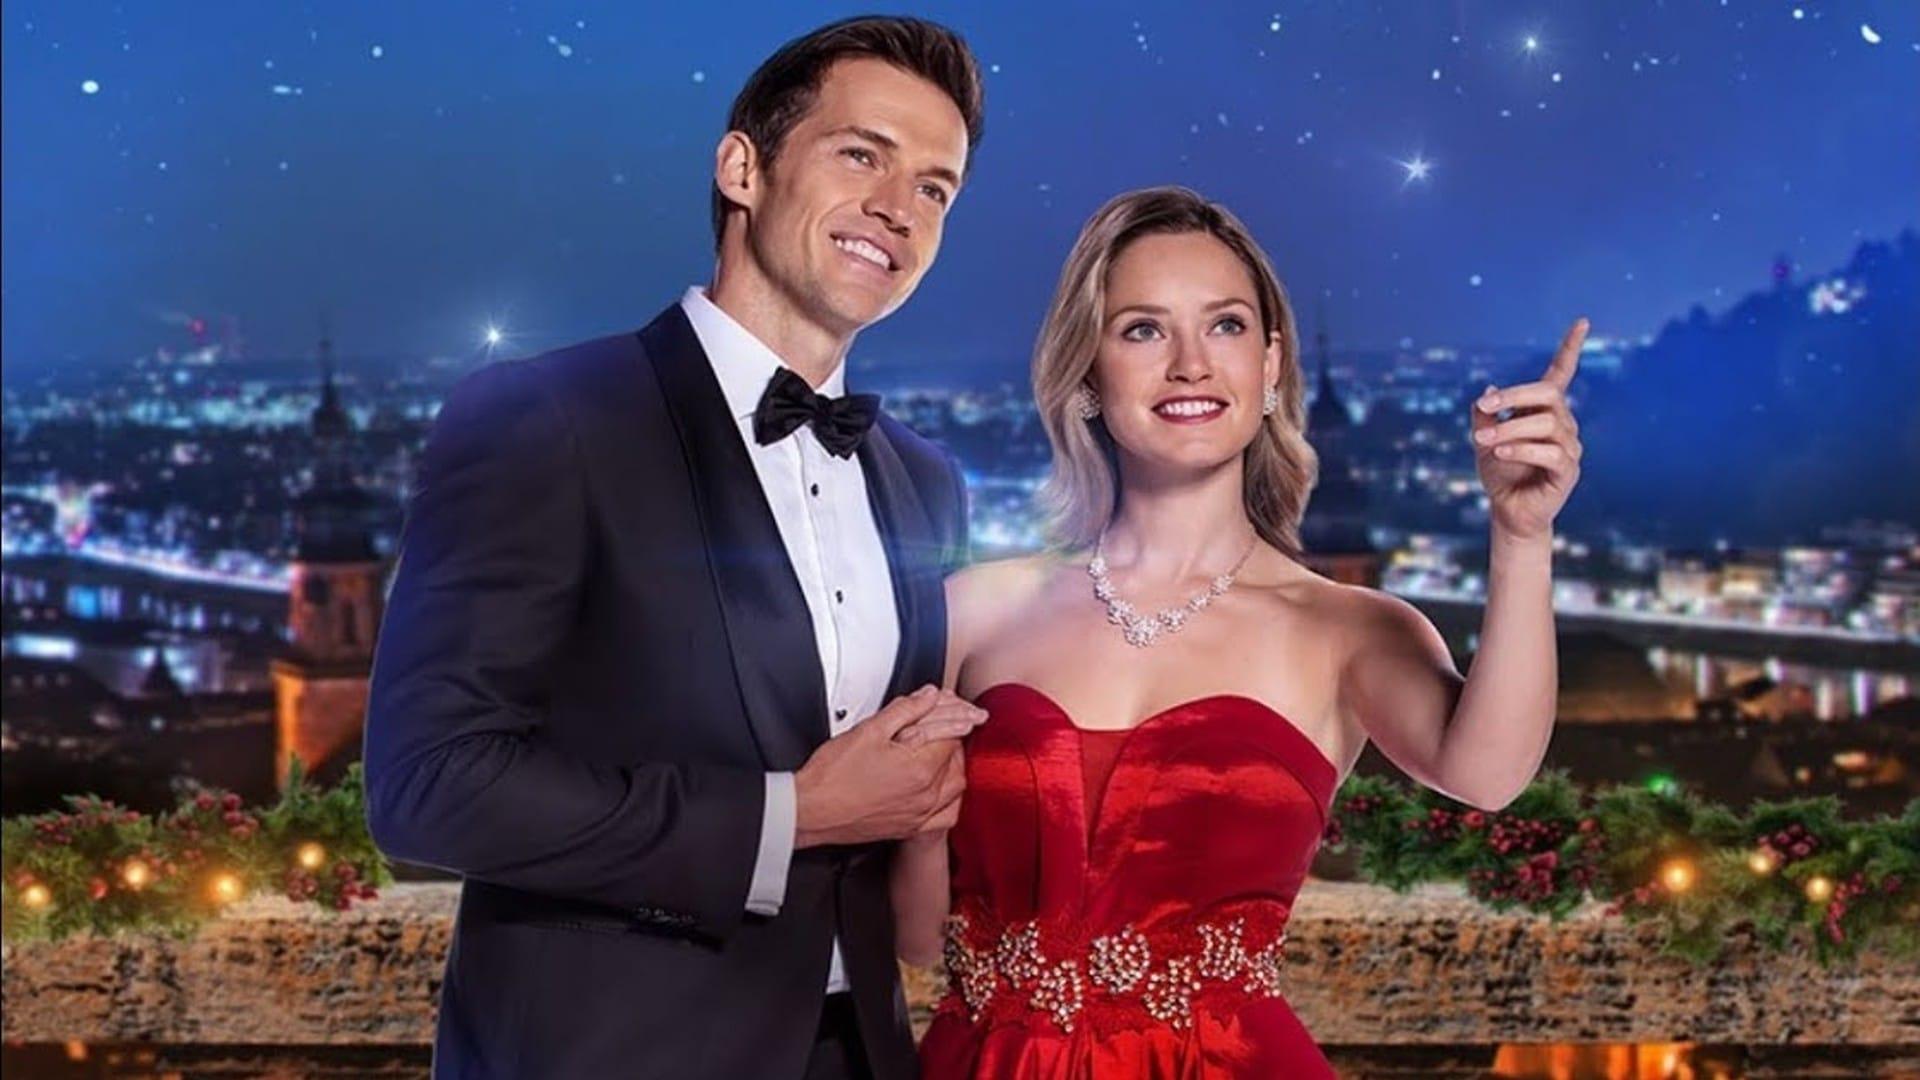 Ver ️ Christmas at the Palace (2018) Streaming HD Online Latino Gratis Español | GNULA SU